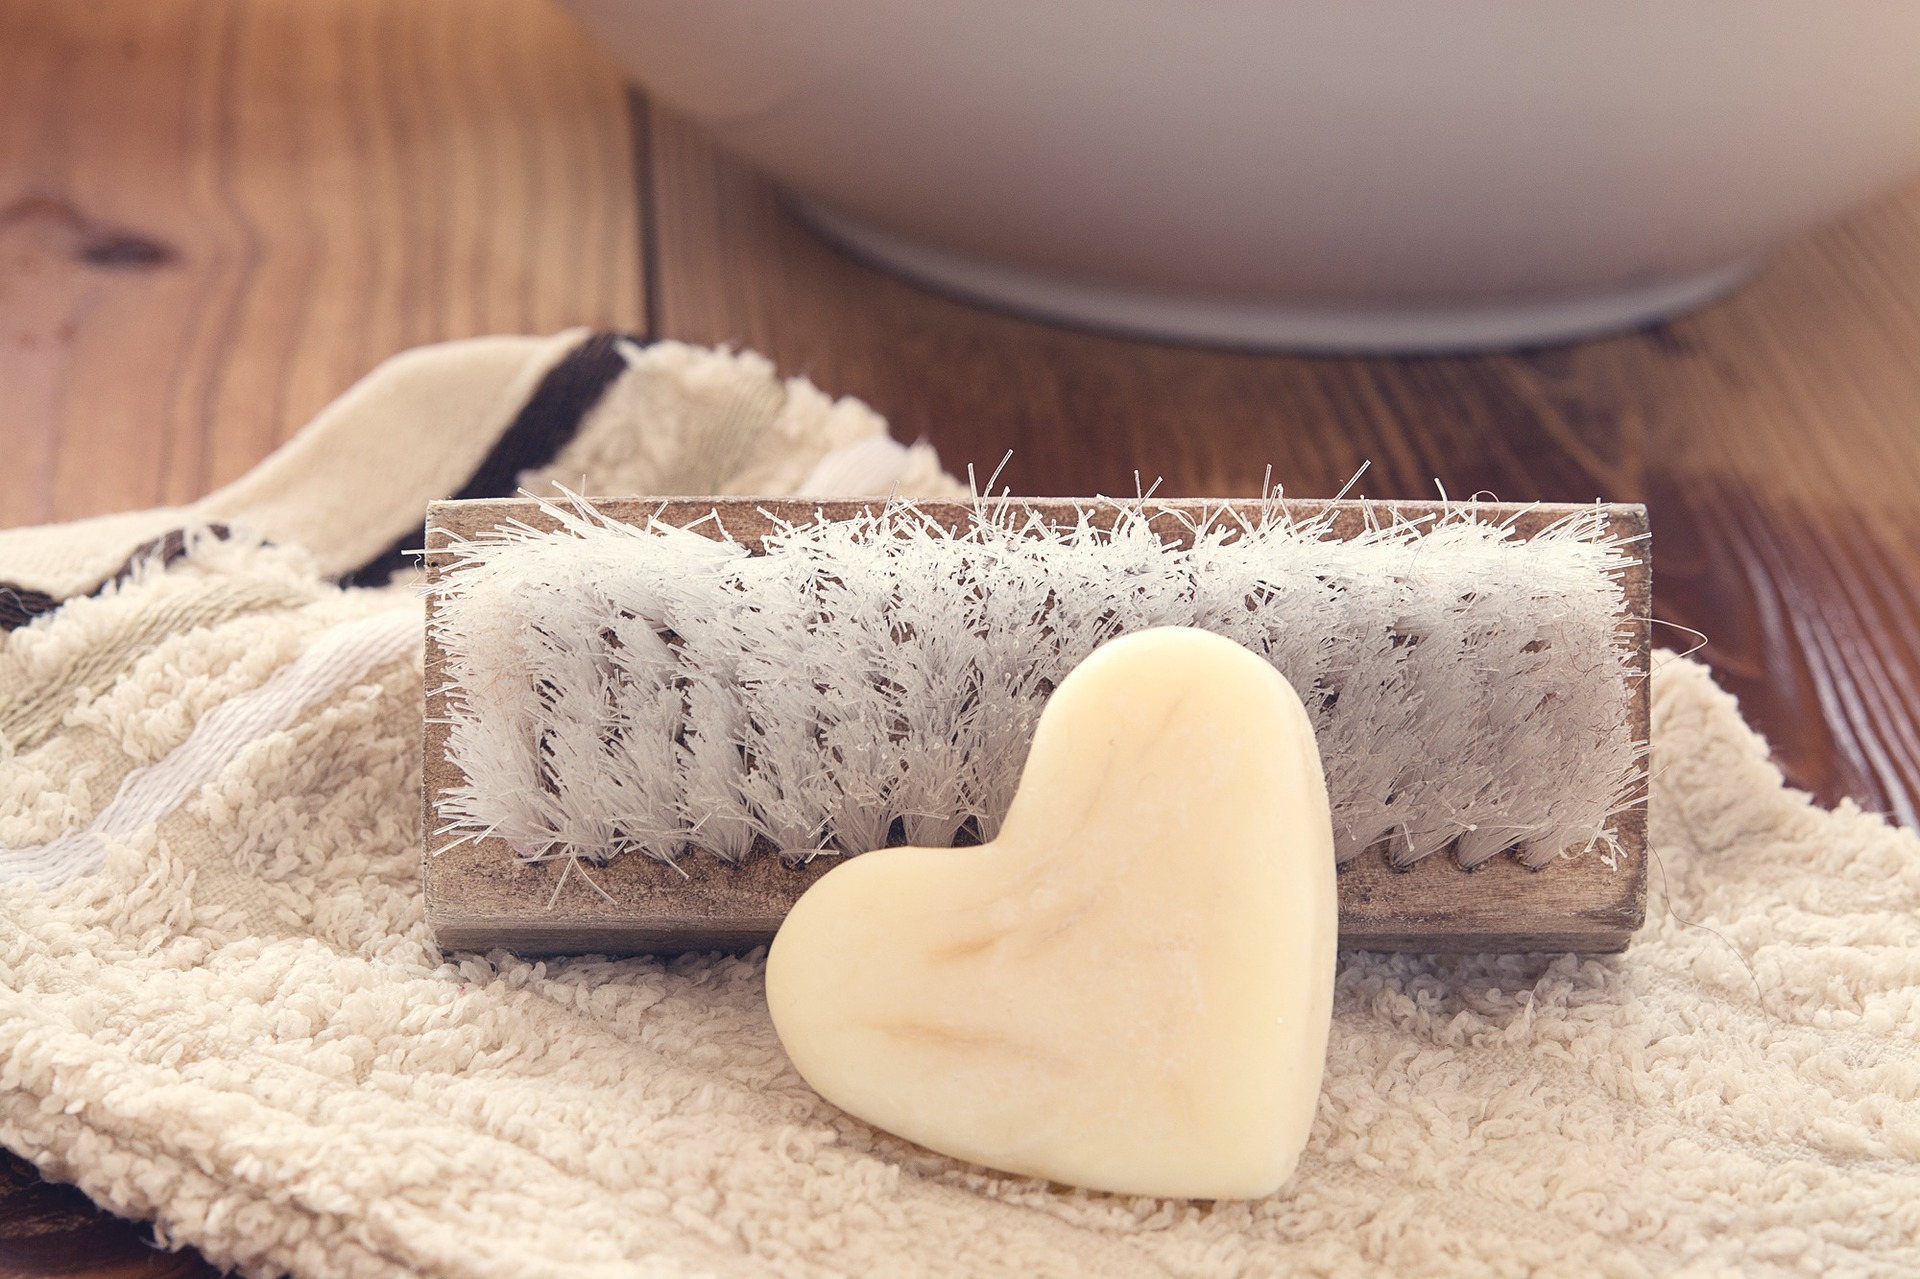 consejos para tu higiene intima